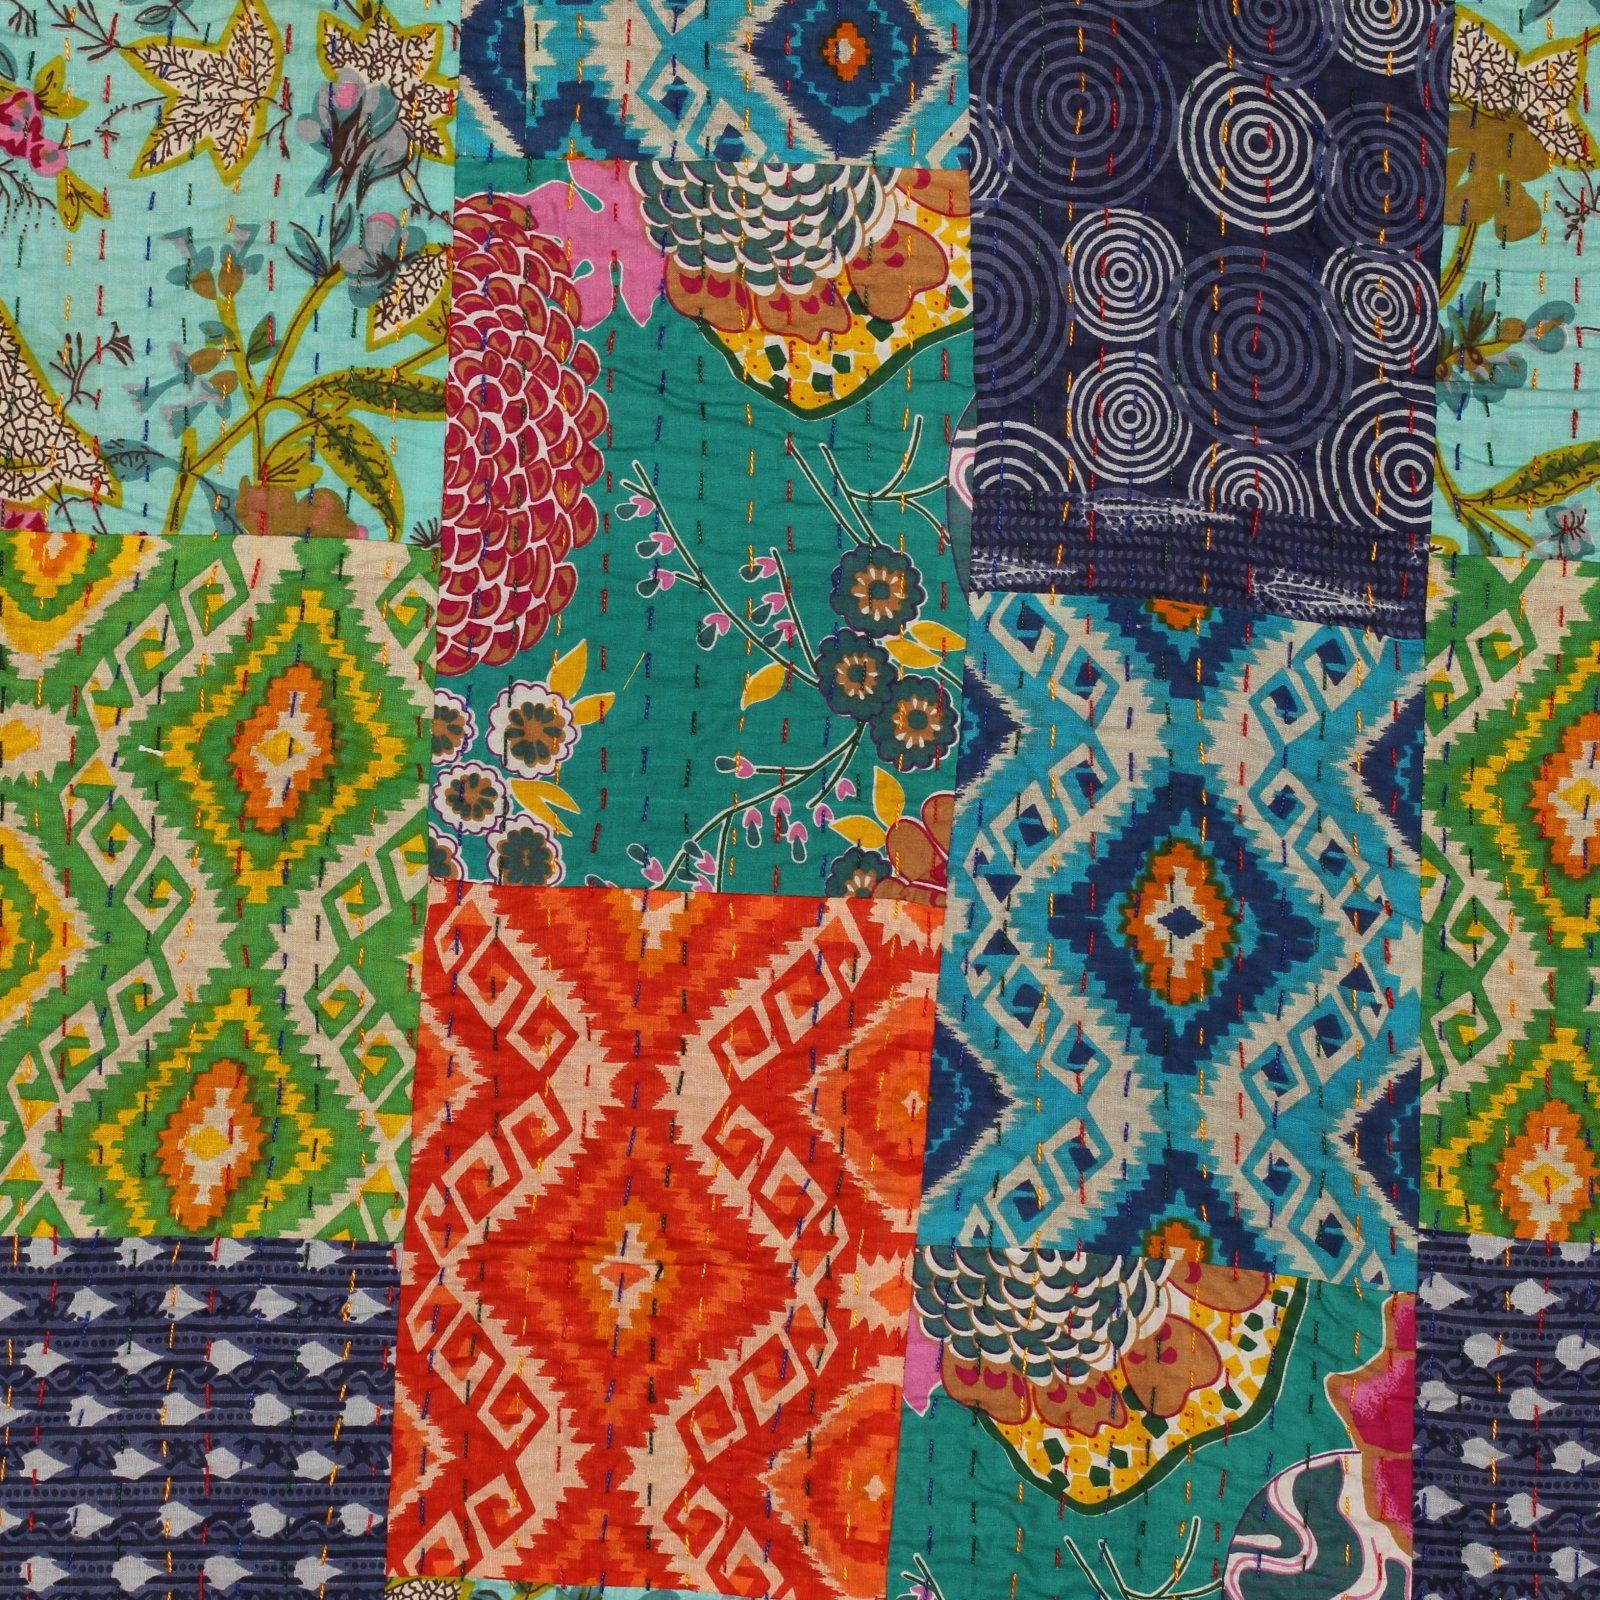 Saliha Handstitched Kantha Cloth